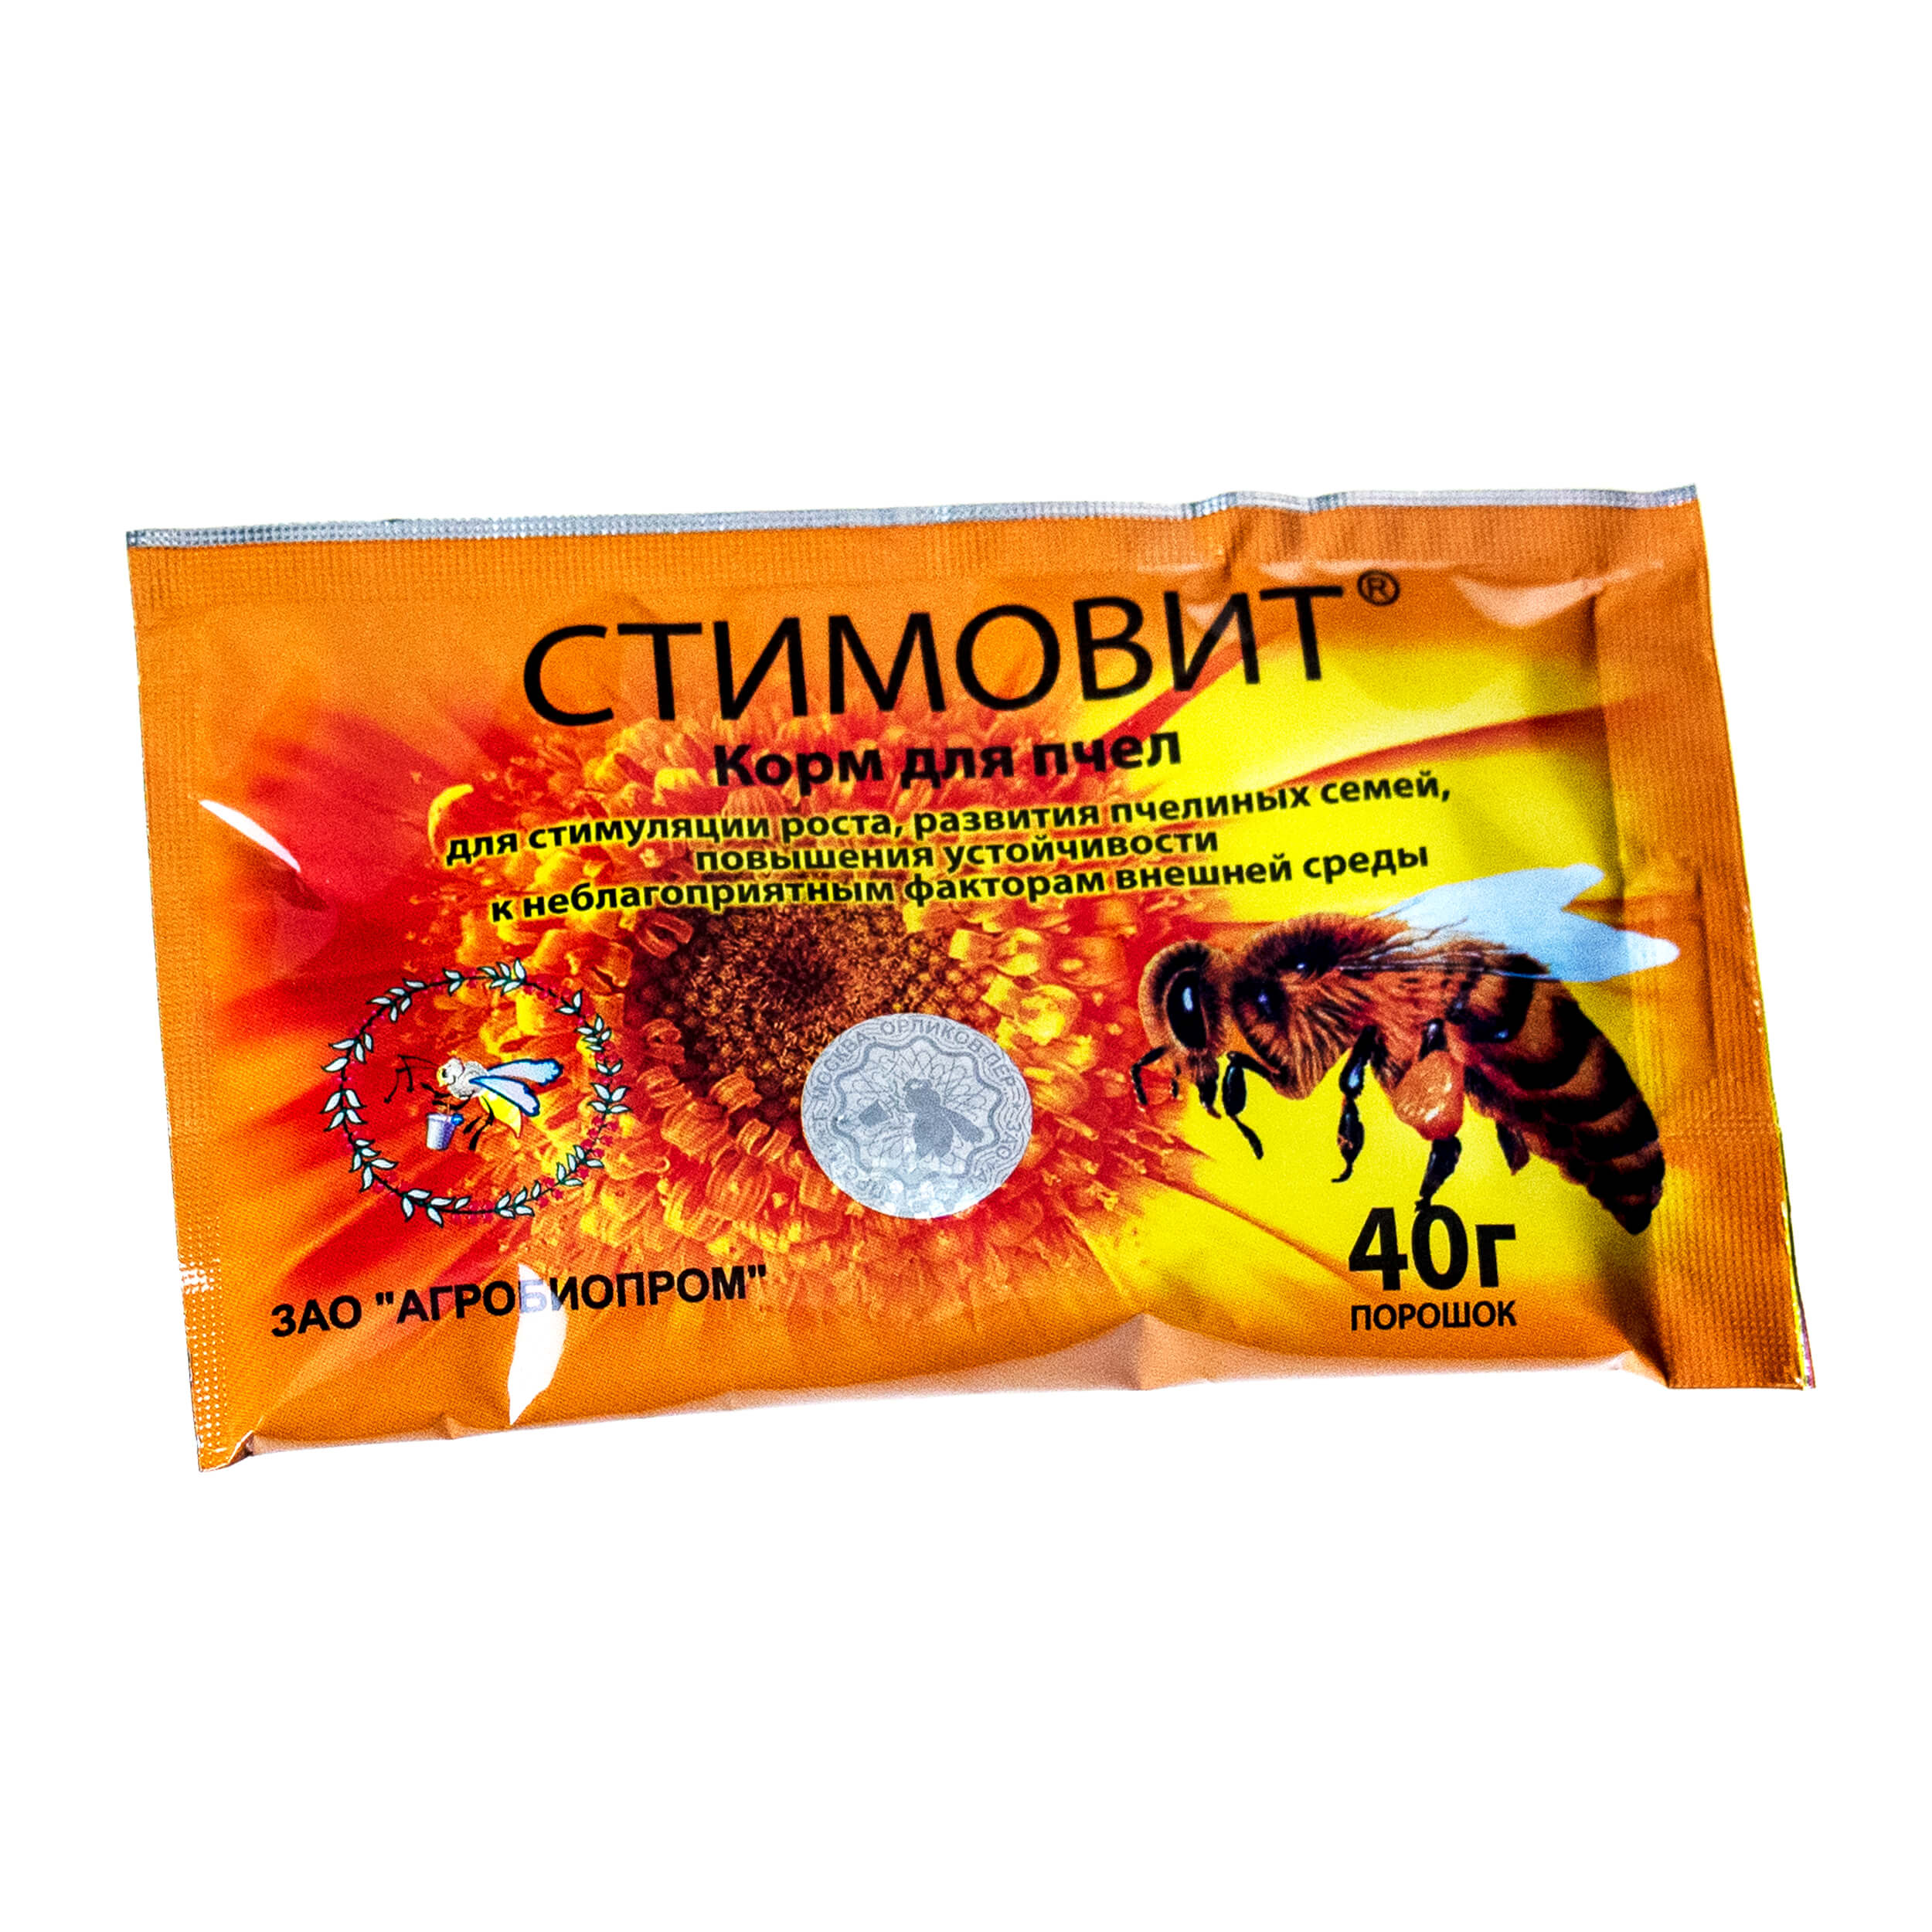 Стимовит (Порошок, 40 гр) фото